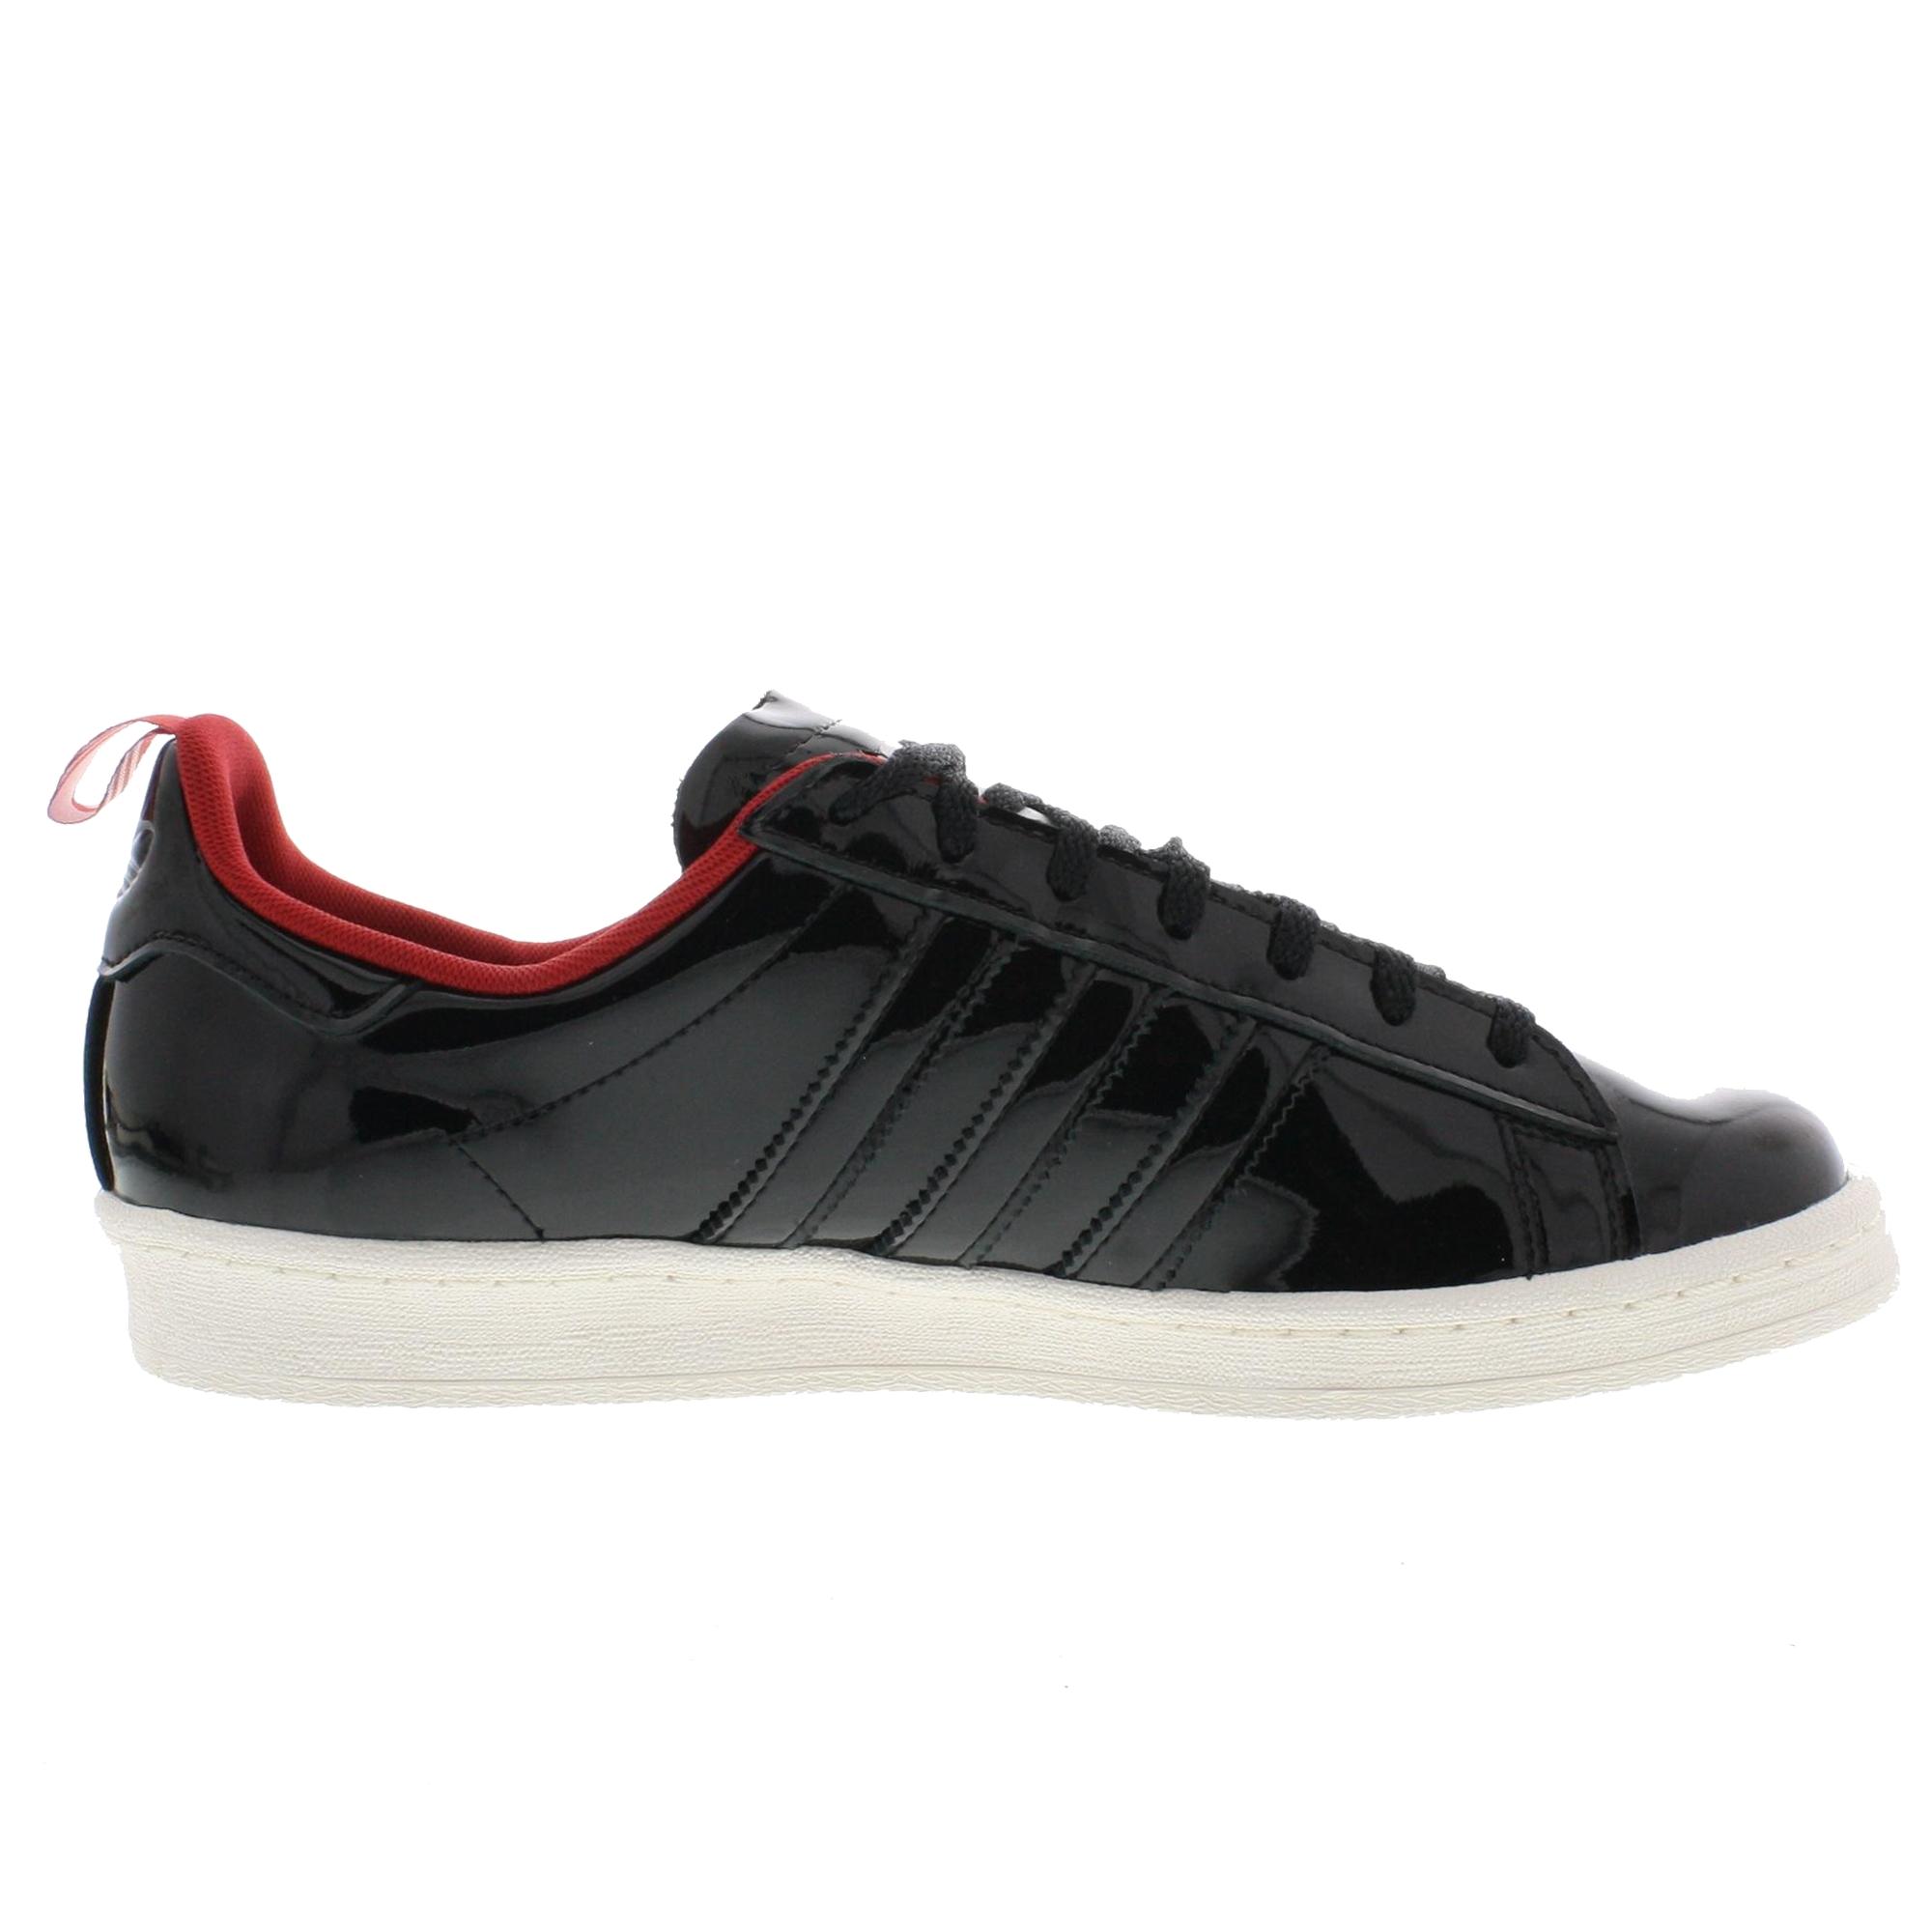 adidas Bw Campus 80s Erkek Spor Ayakkabı  G96744 - Barcin.com 65af9ee7c